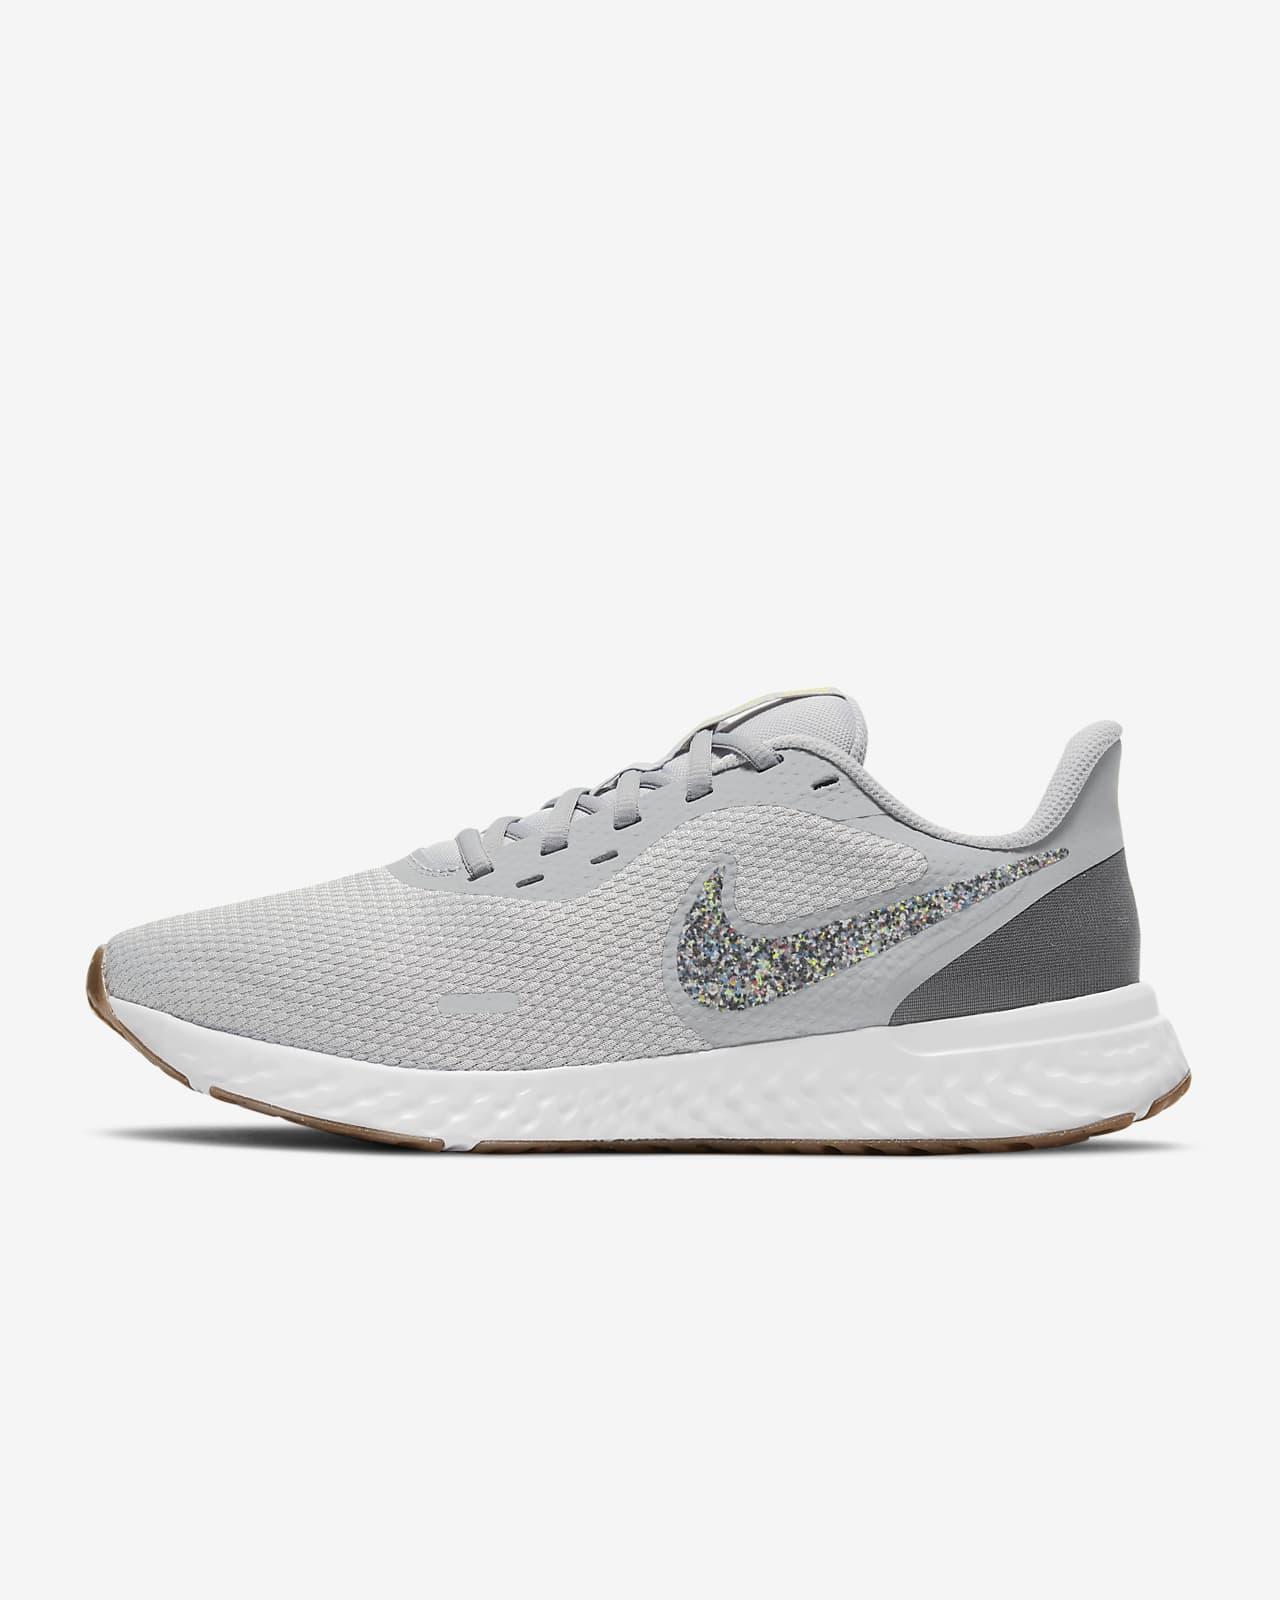 Nike Revolution 5 Premium Men's Running Shoe